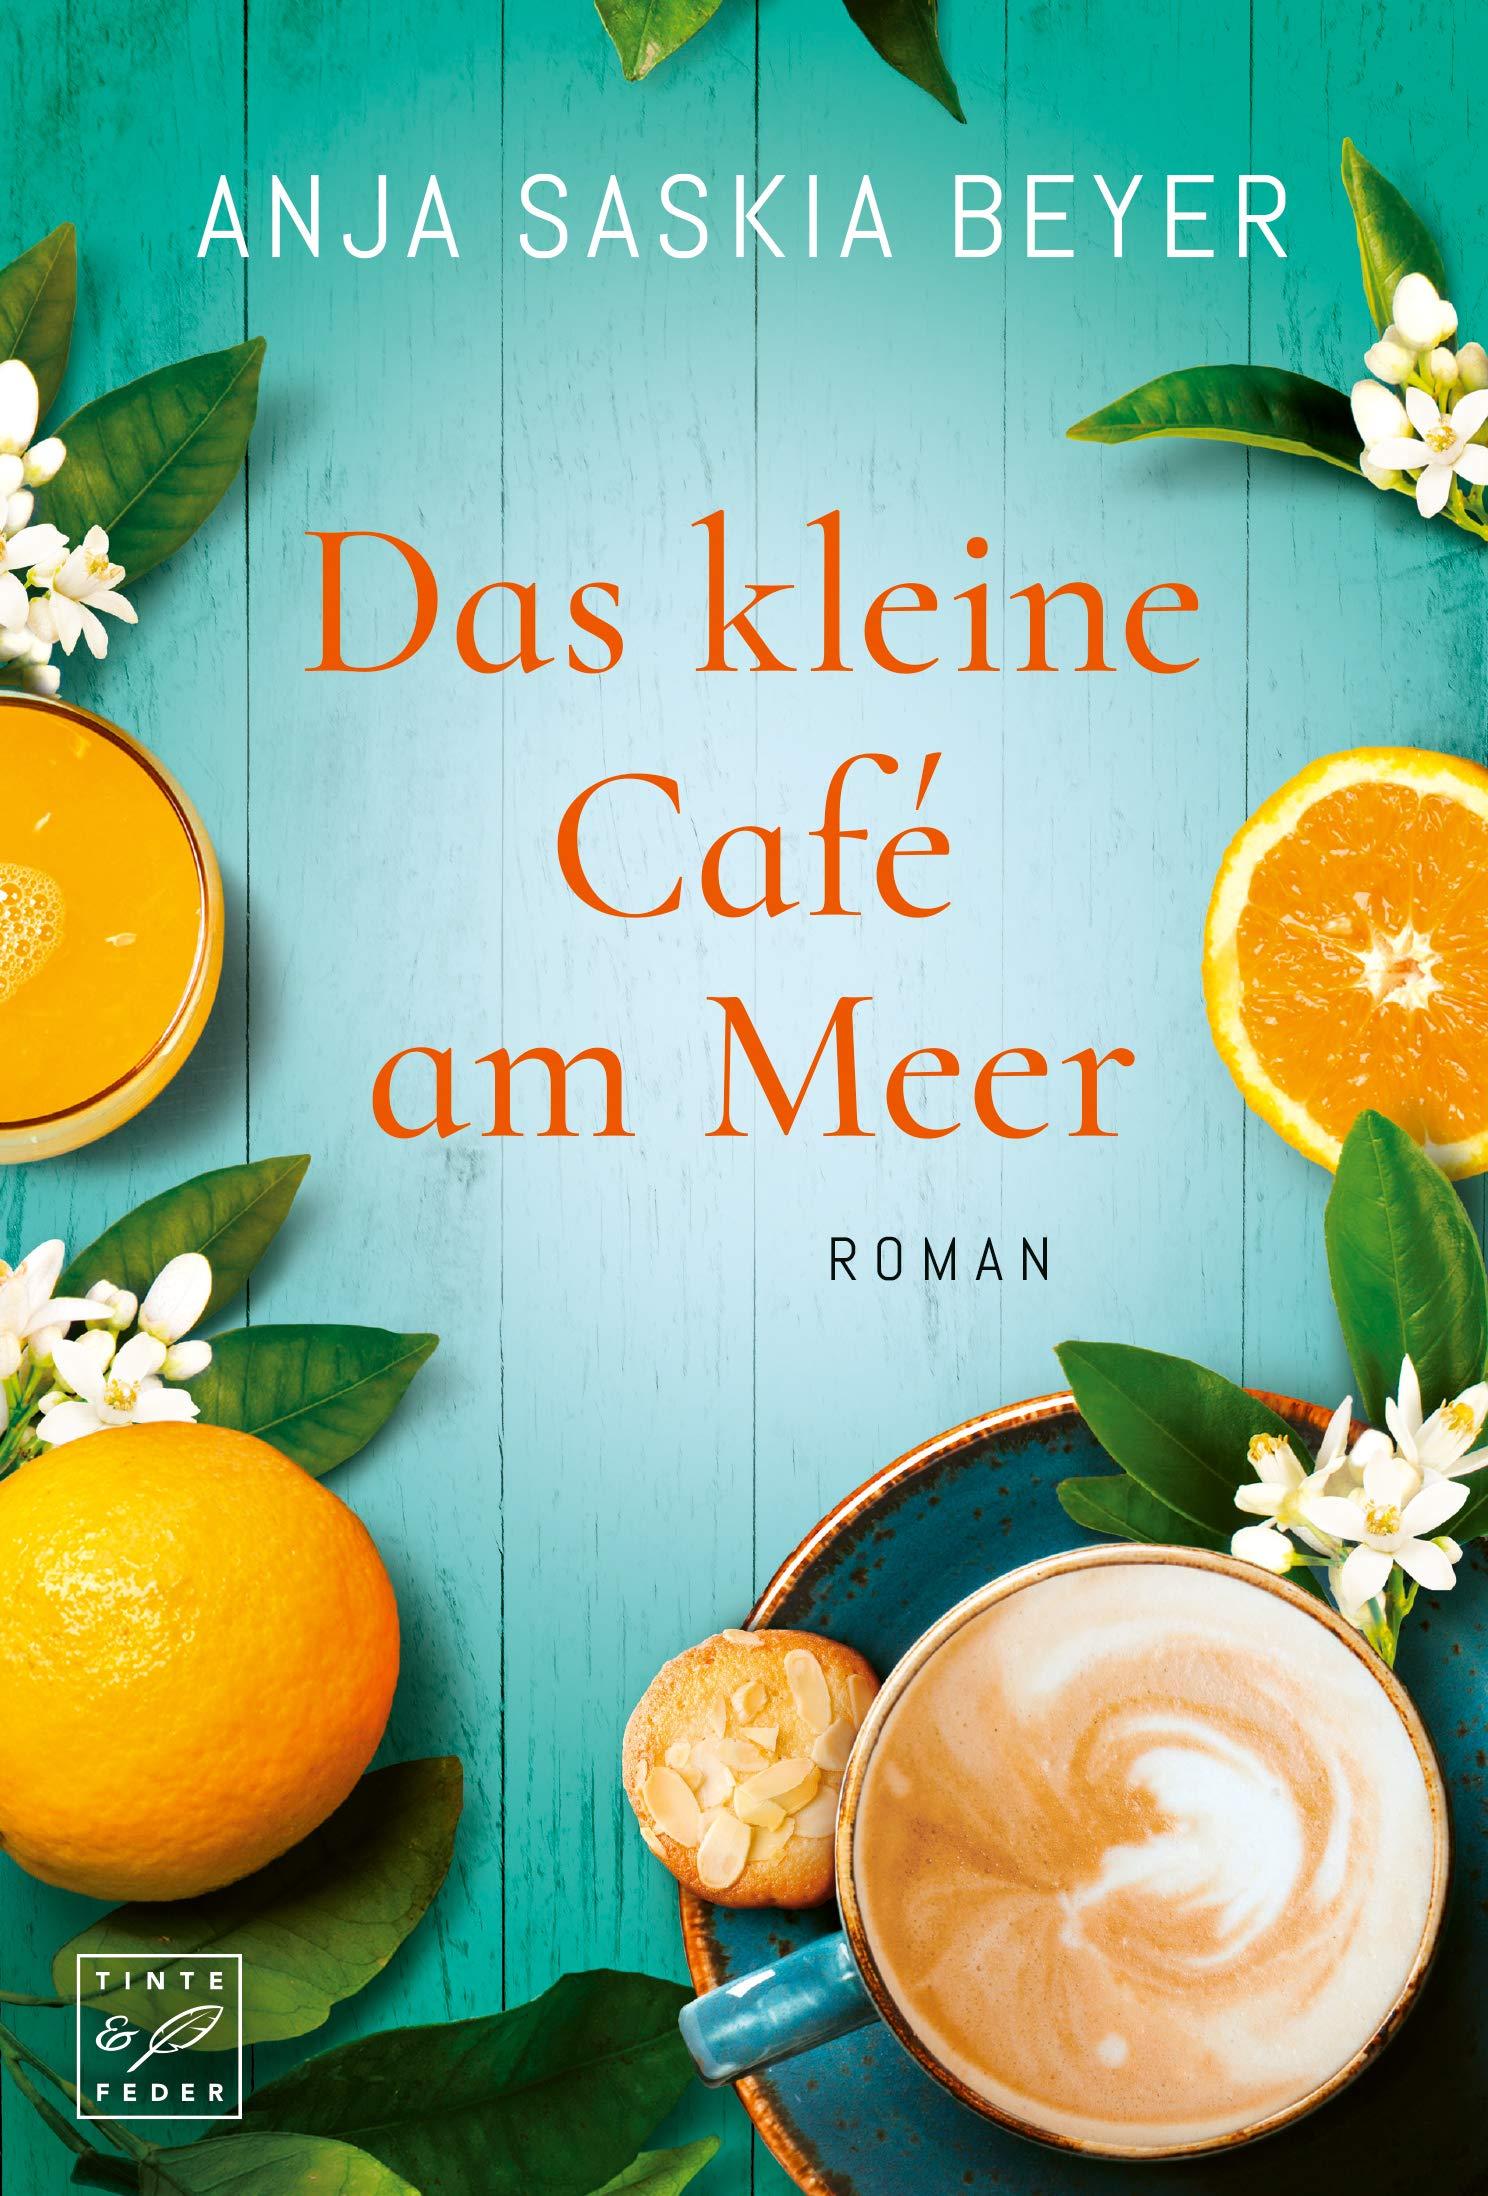 DAS KLEINE CAFÉ AM MEER